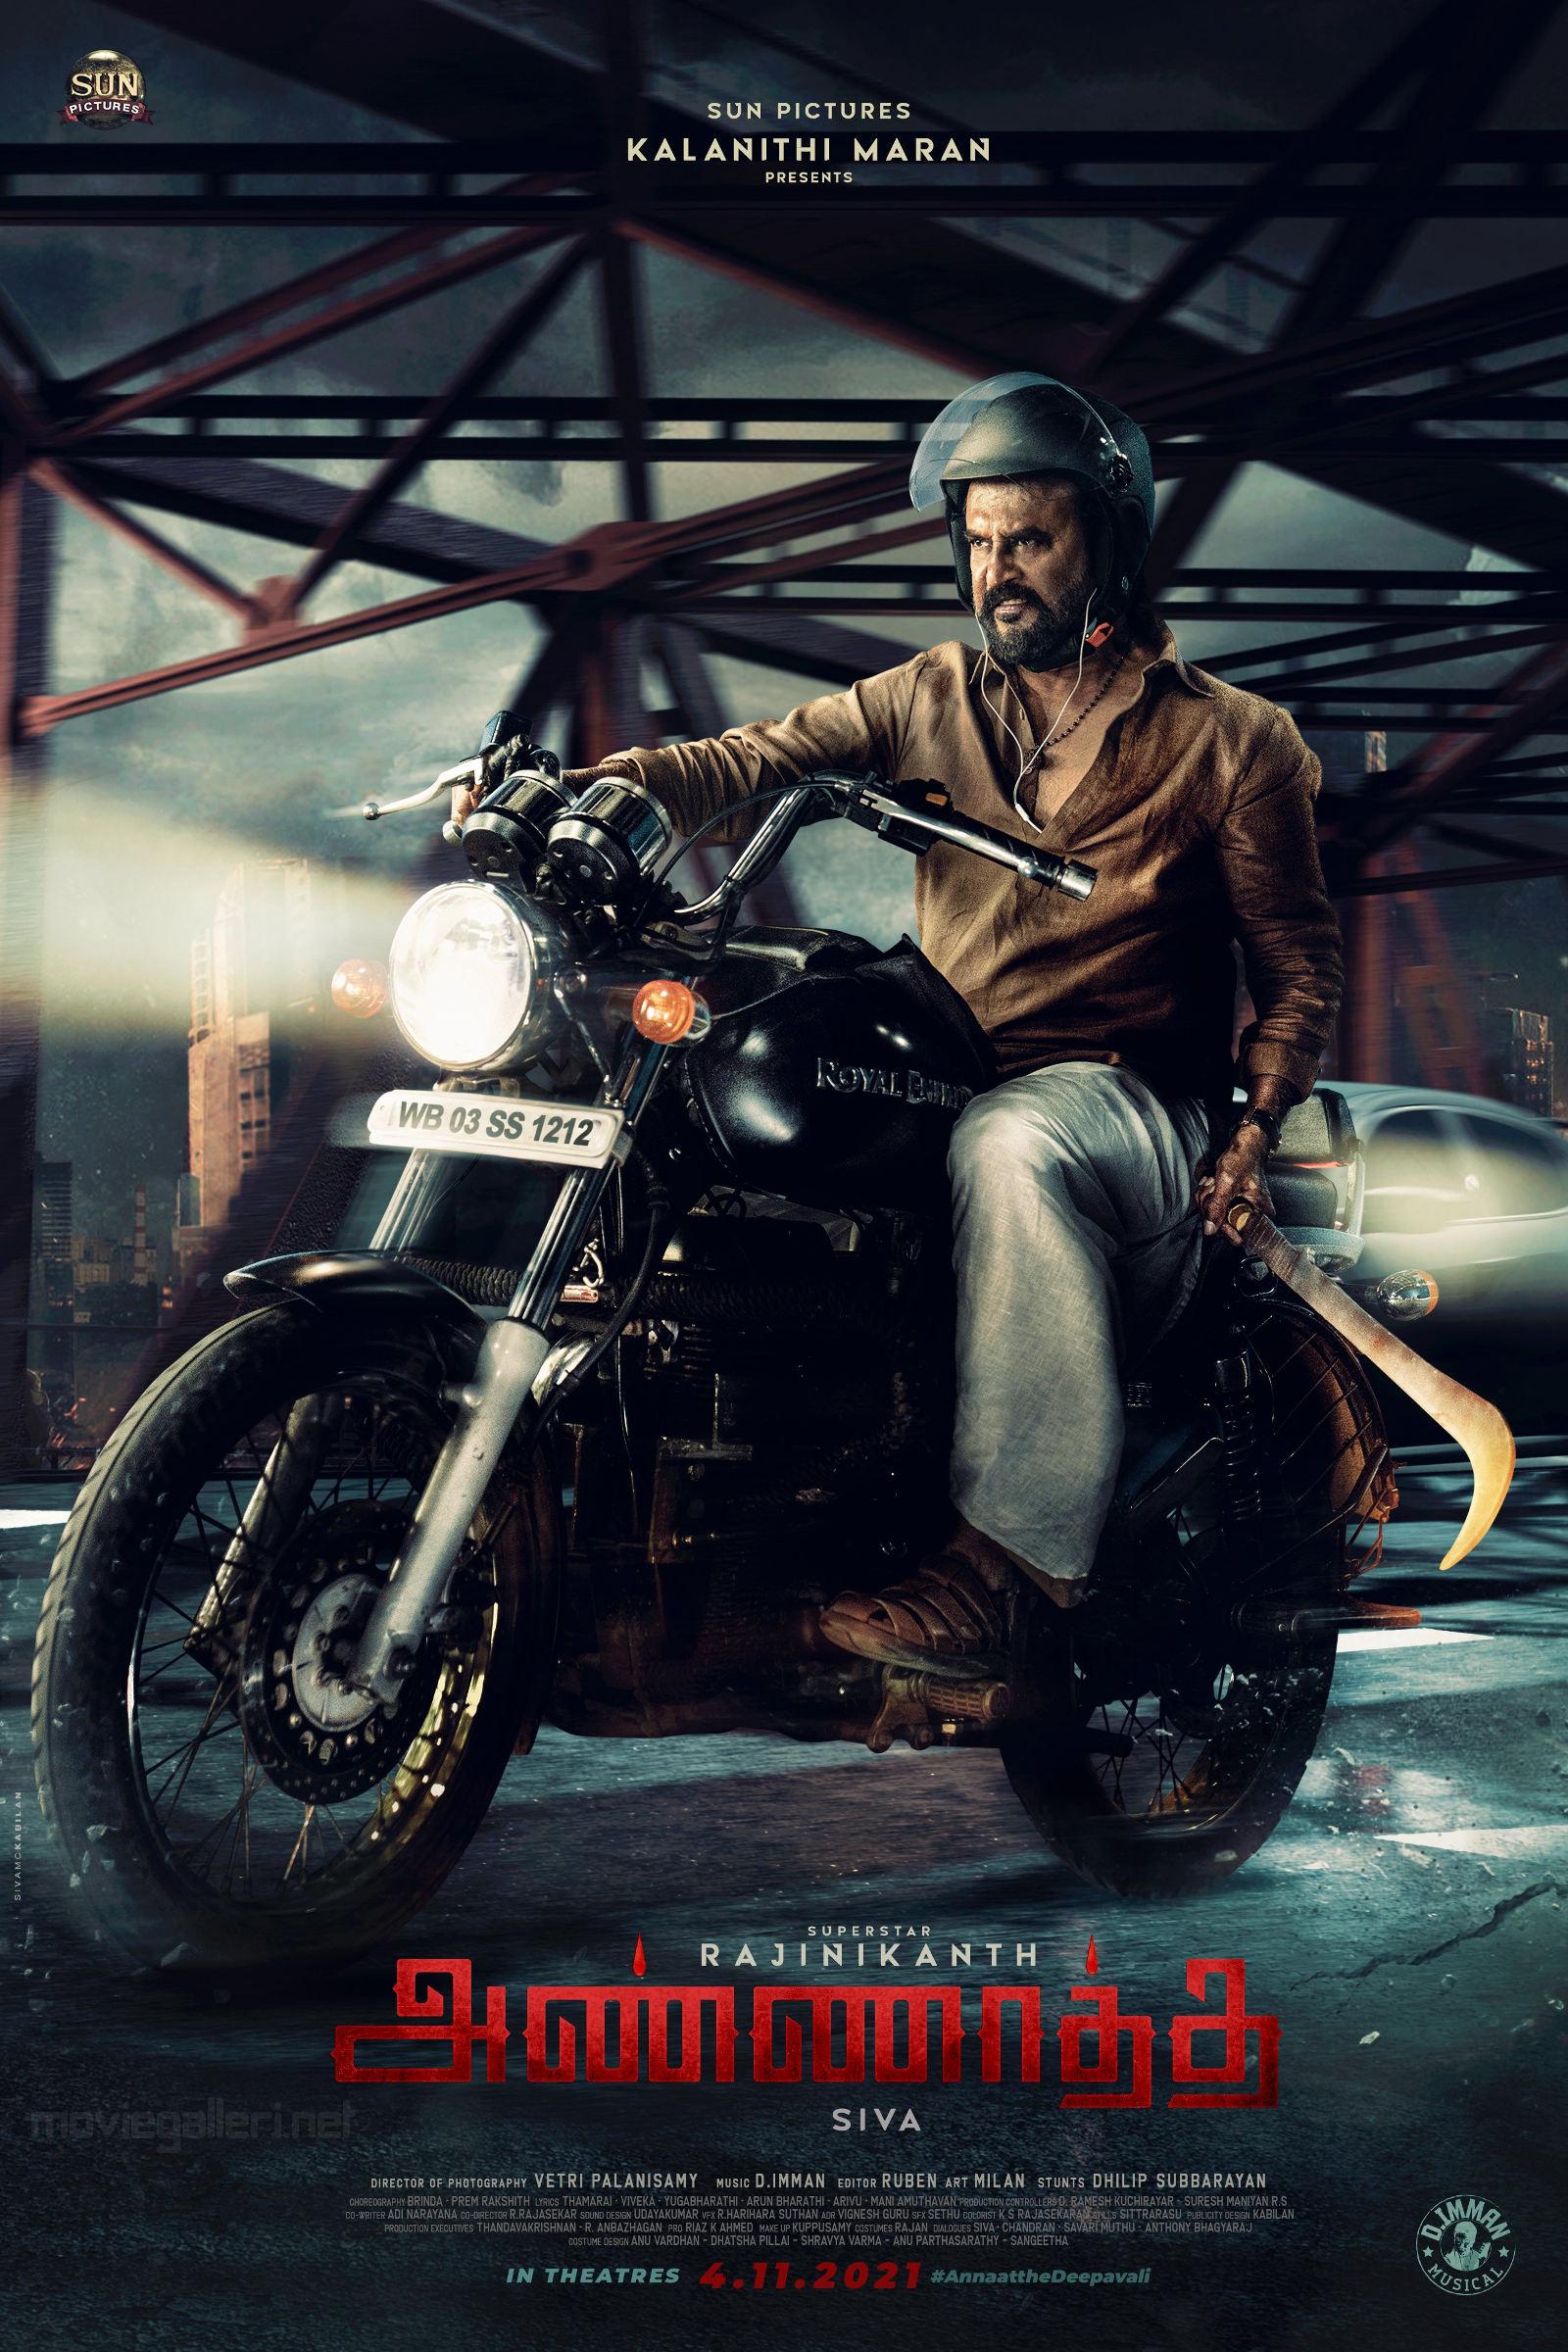 Rajinikanth Annaatthe Second Look Poster HD